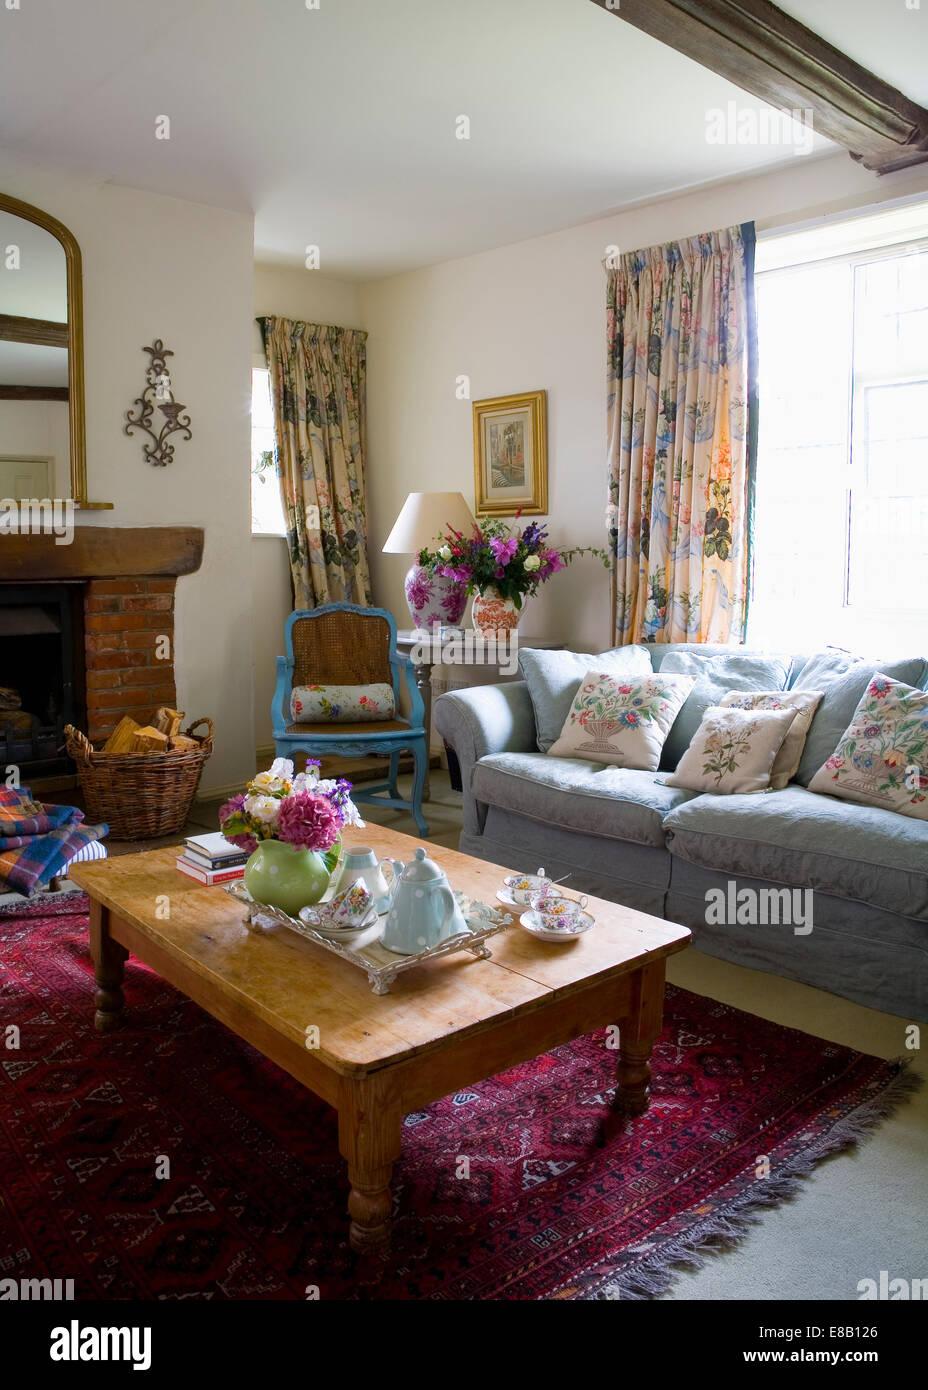 blaues sofa vor fenster mit floral gardinen im land. Black Bedroom Furniture Sets. Home Design Ideas